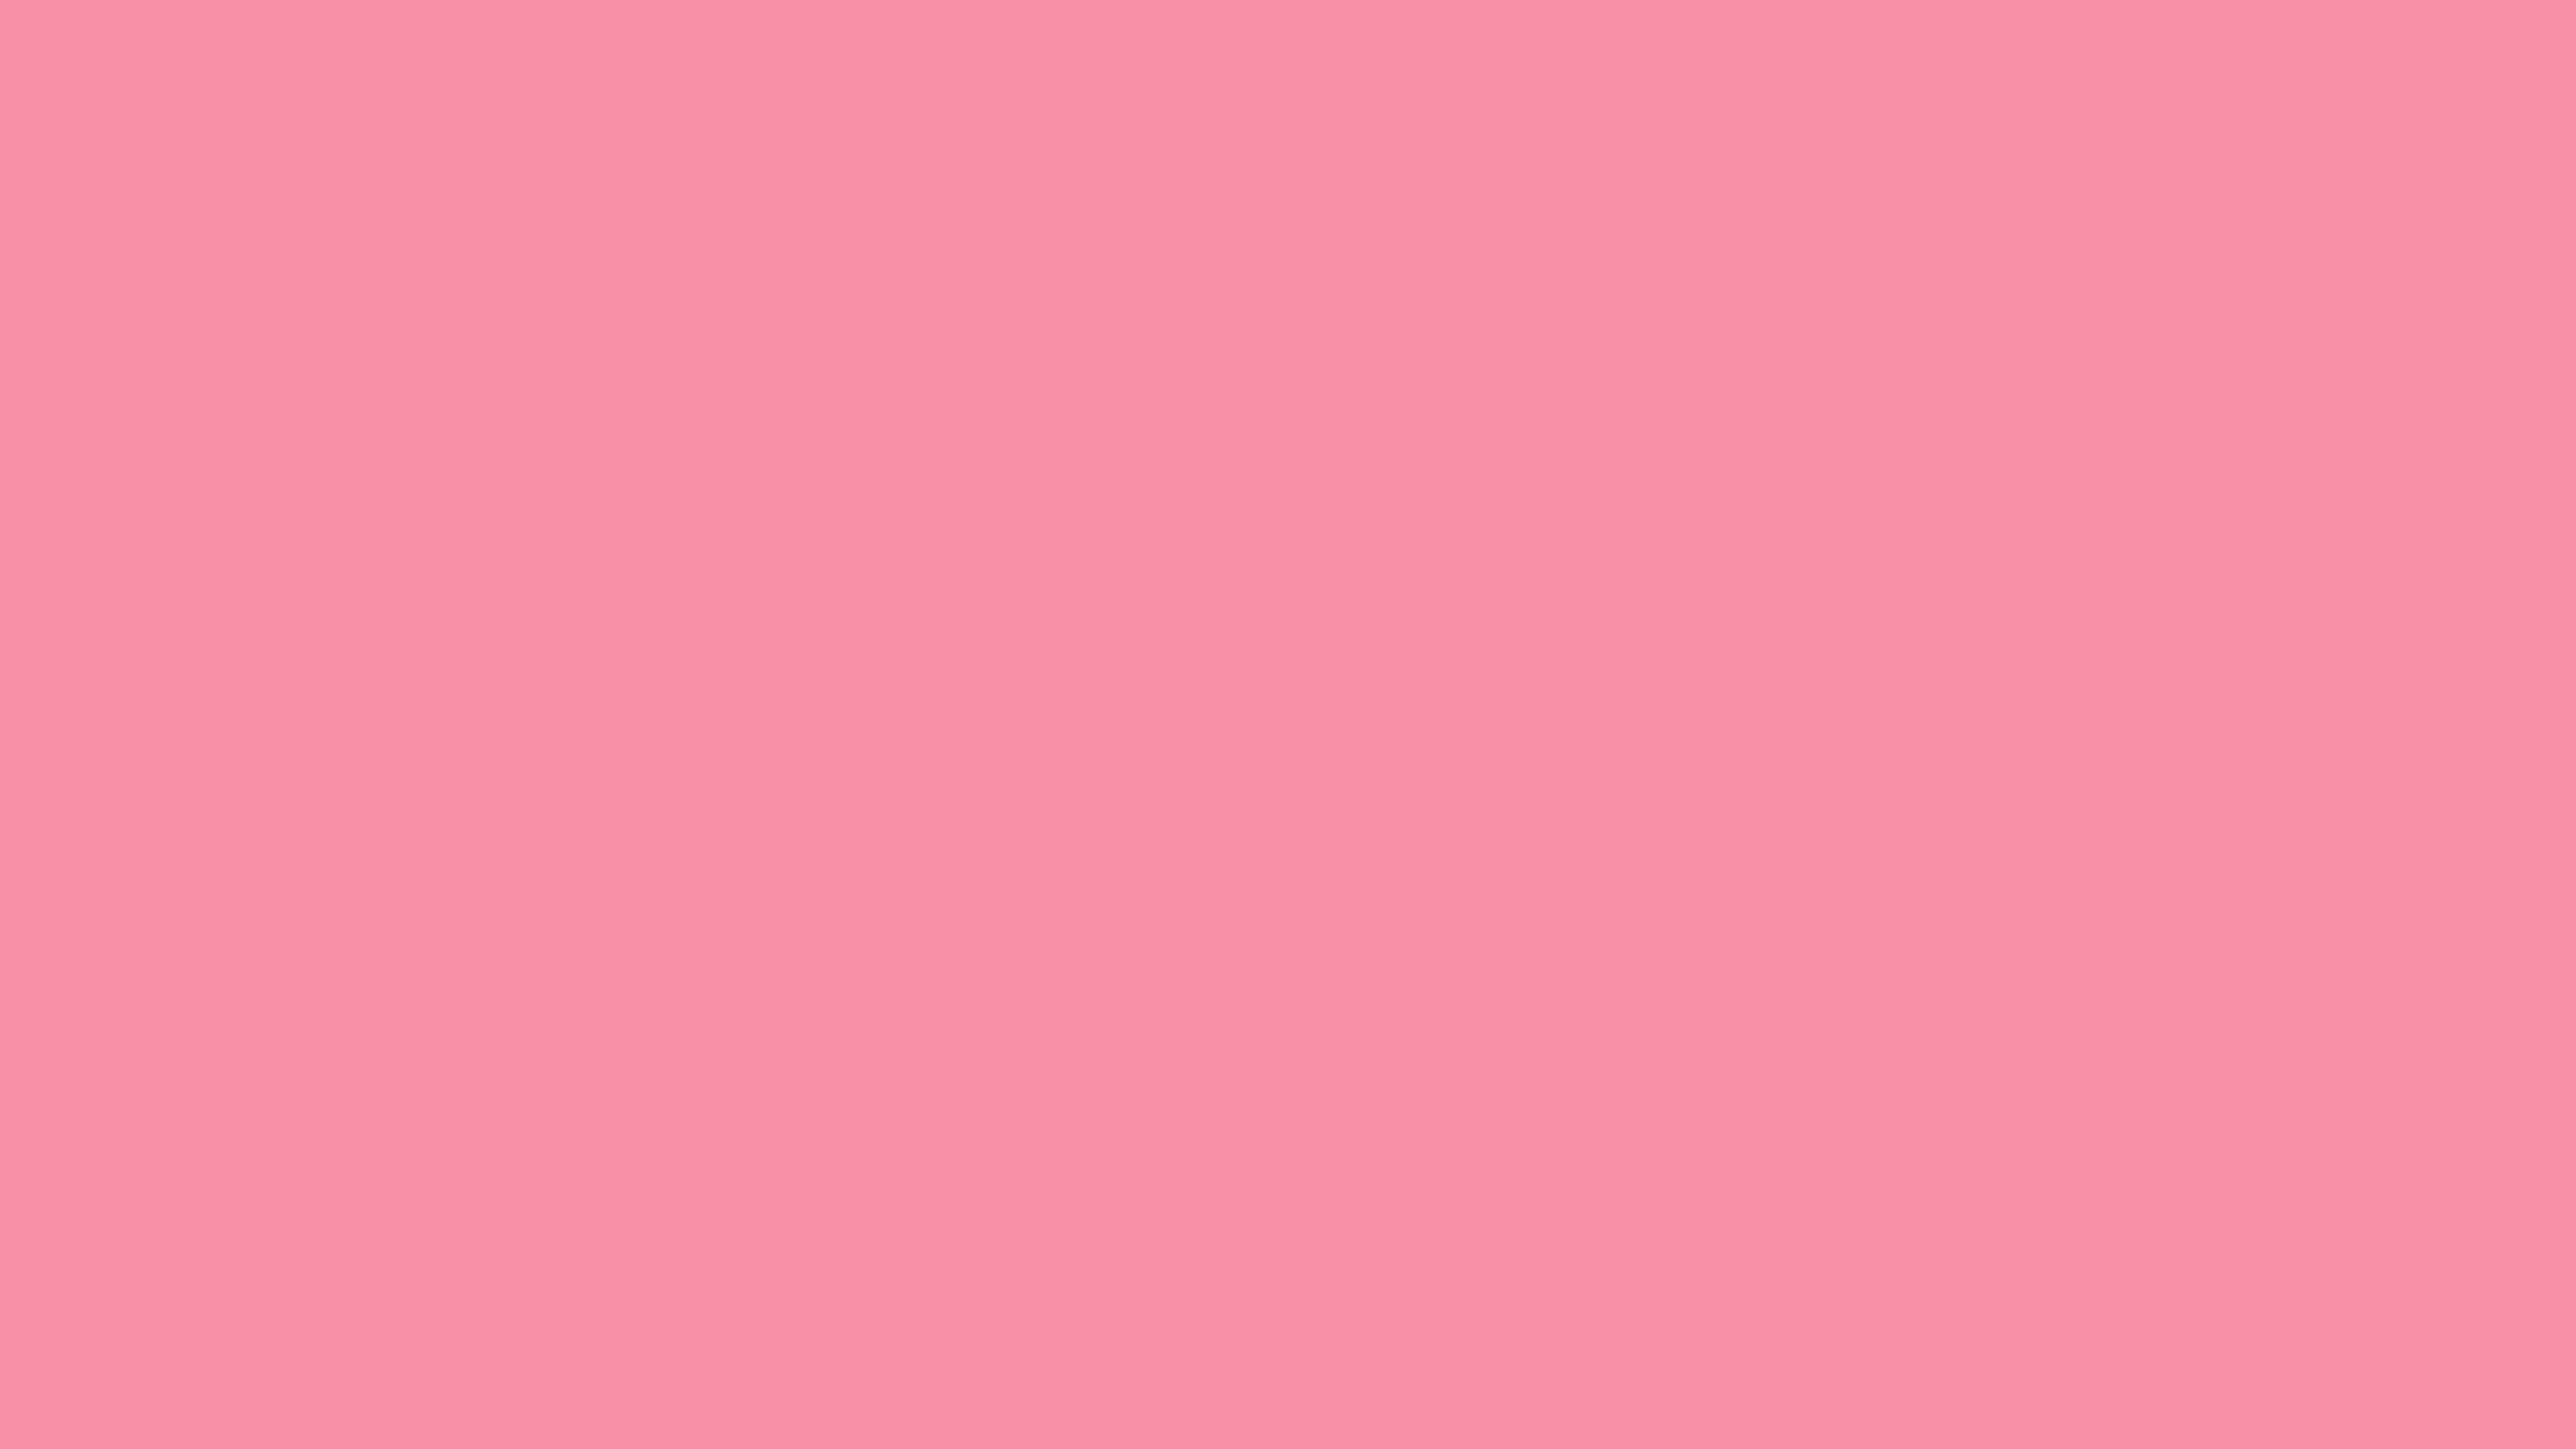 5120x2880 Pink Sherbet Solid Color Background